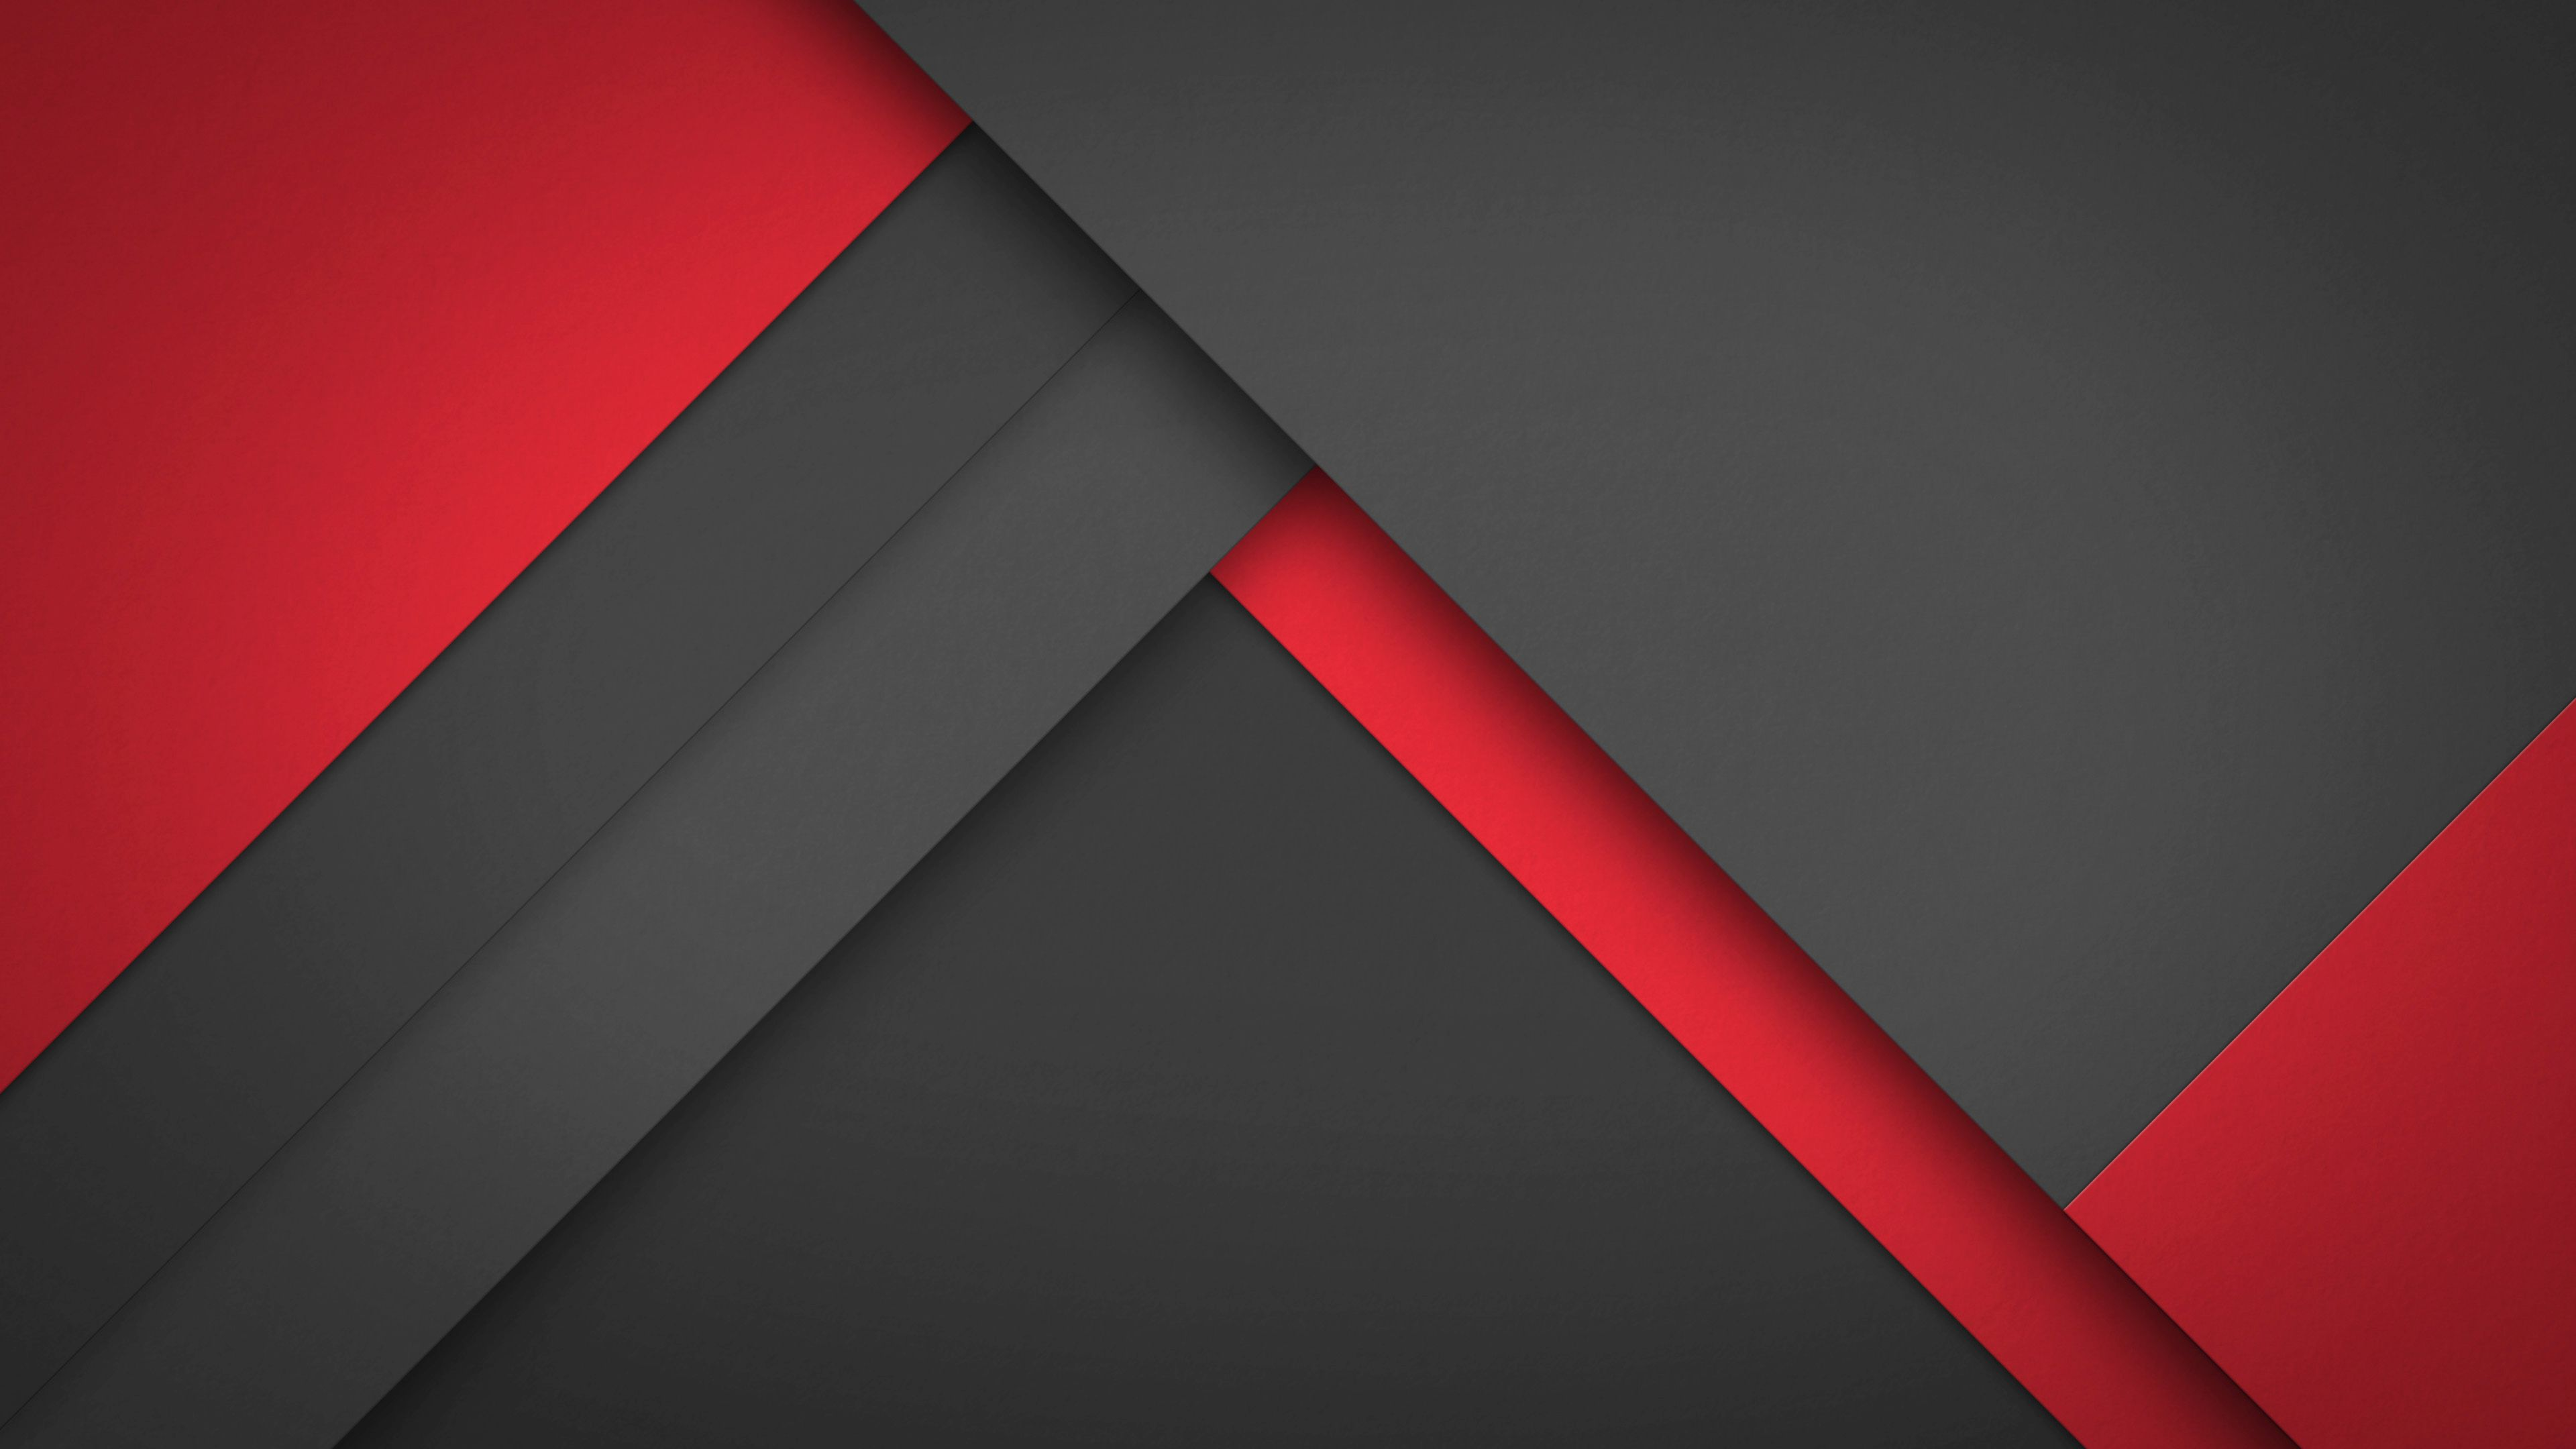 4K Material Design Wallpapers - Nate Wren - Graphic Design